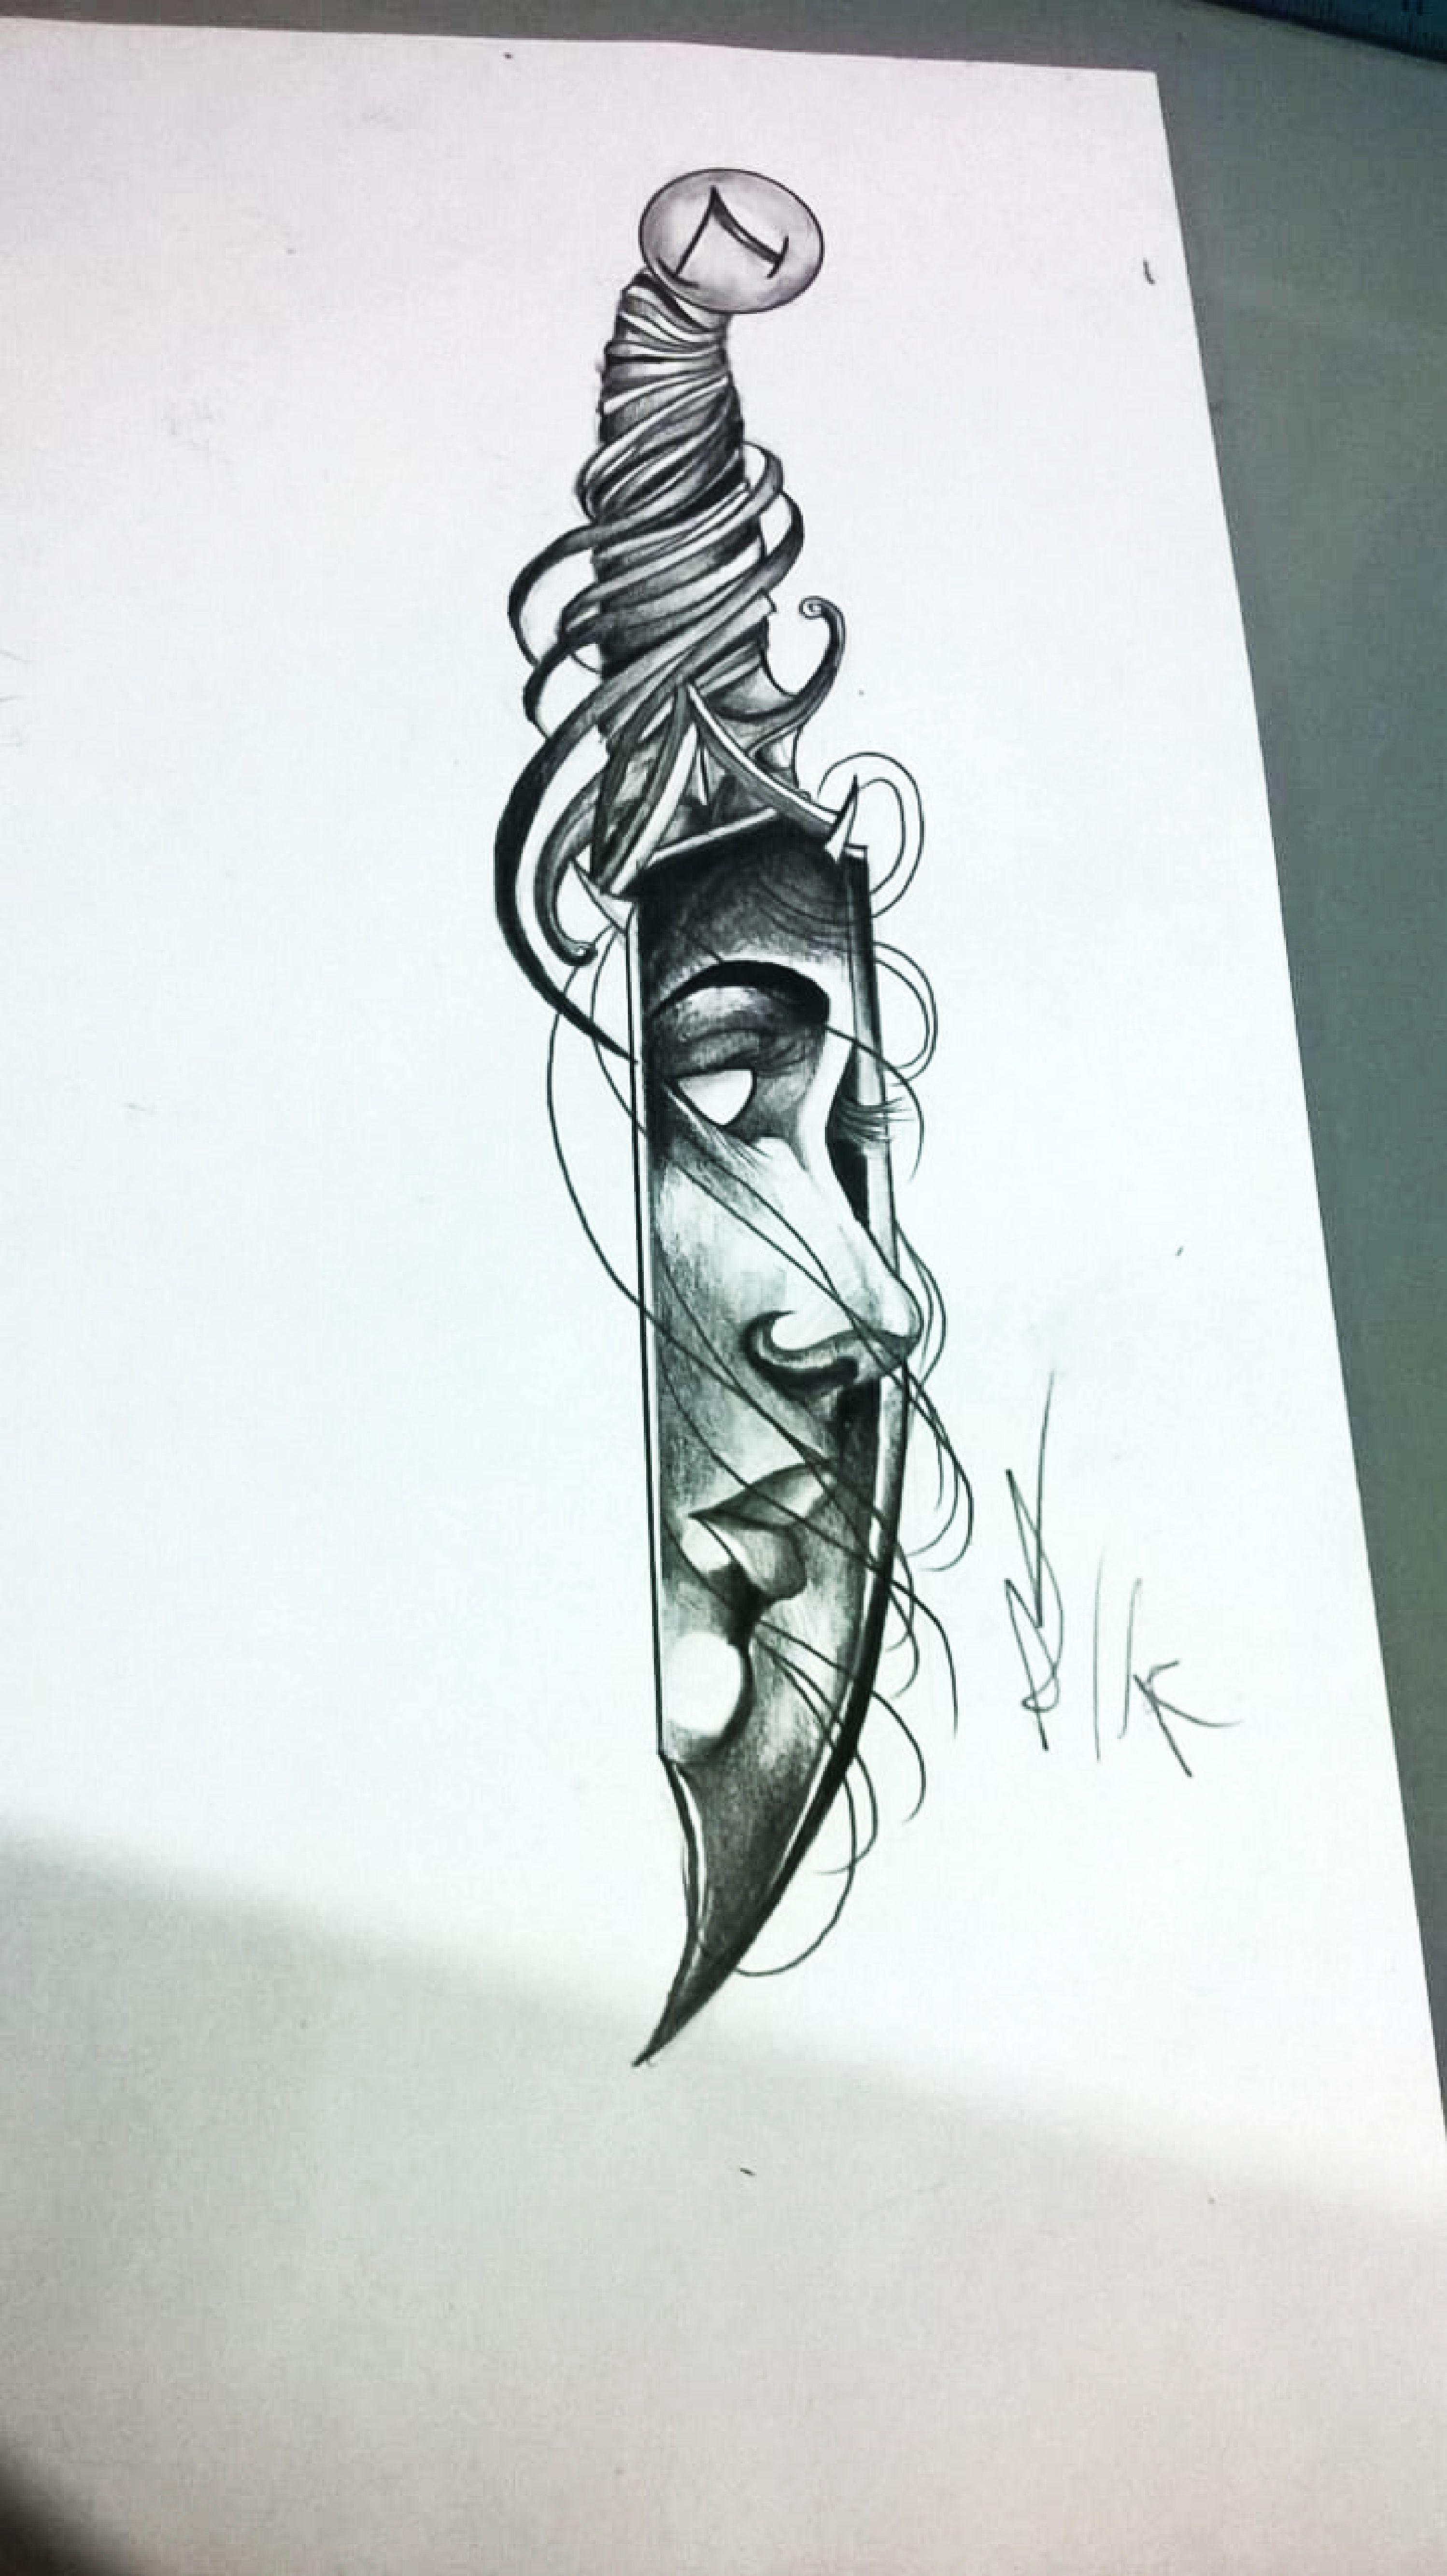 Cuchillo Rostro Mujer Sleeve Tattoos Body Art Tattoos Tattoos For Guys